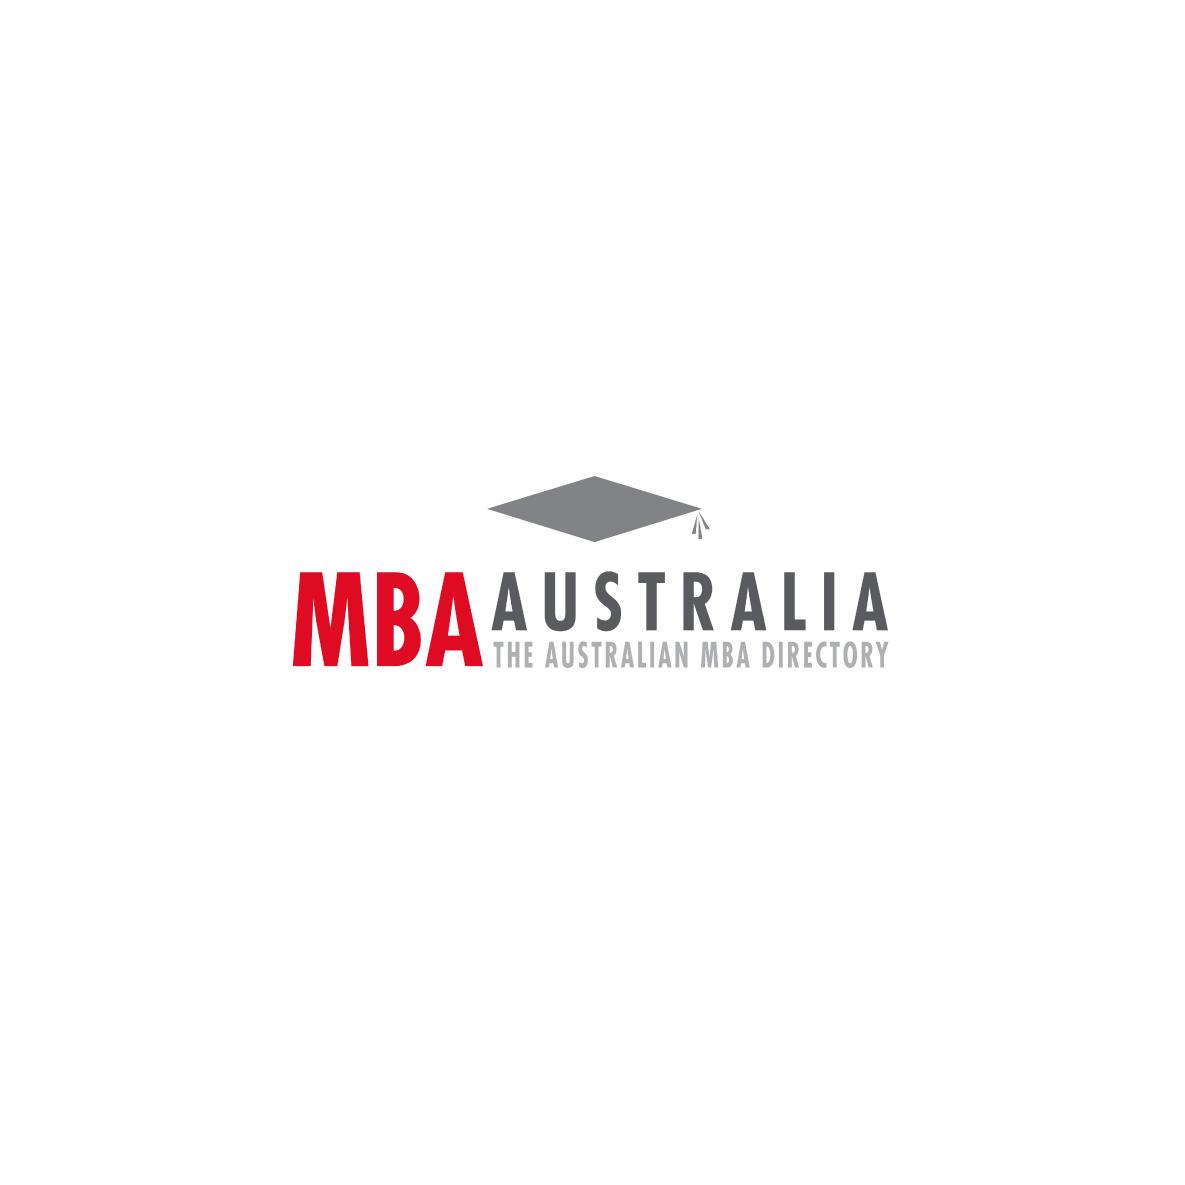 MBA Australia - Giberan